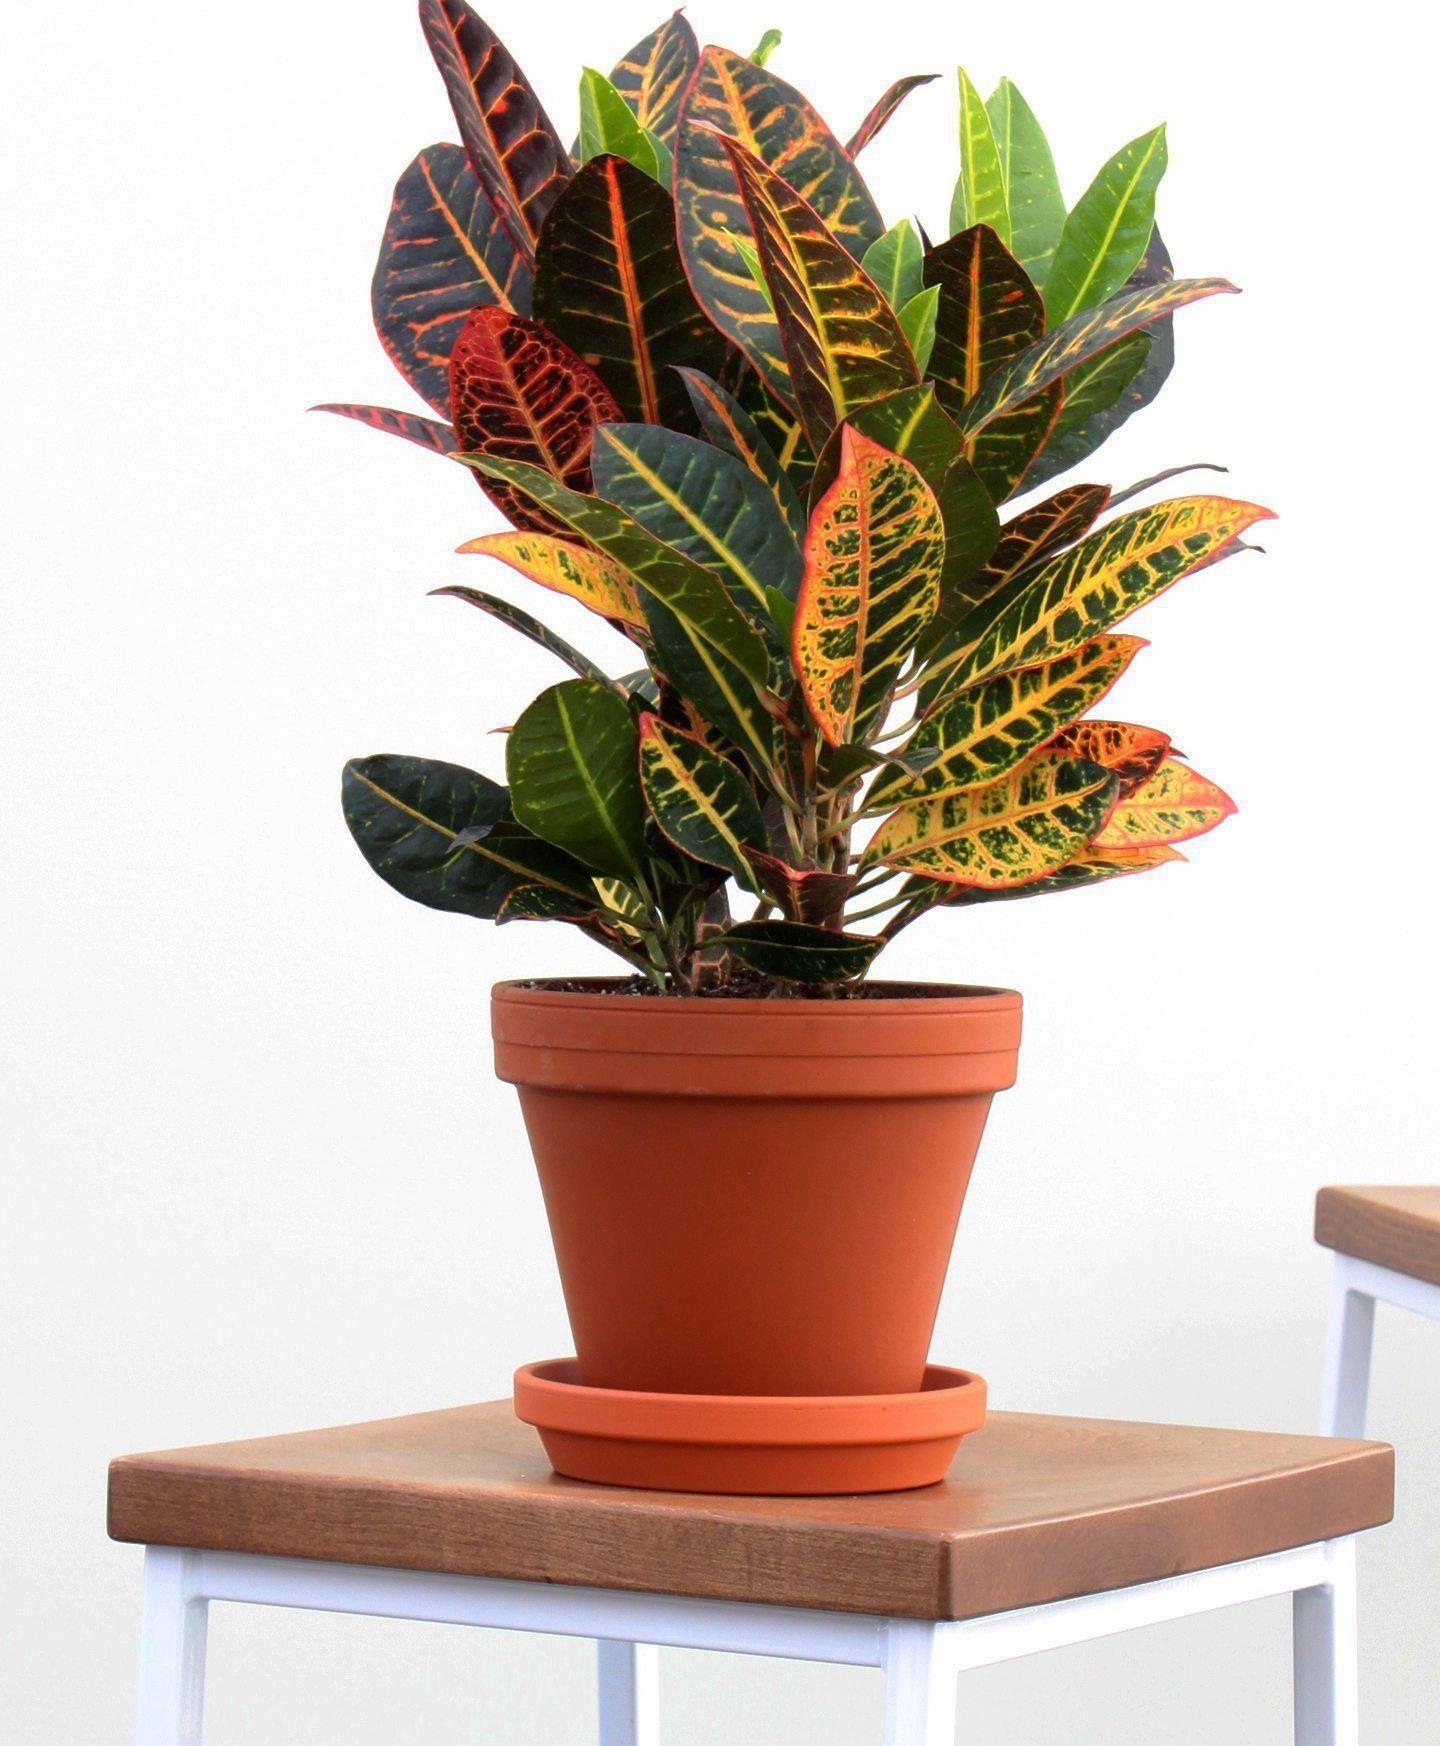 Buy Croton Petra Indoor Plant, 8 Inch Terra Cotta Pot For